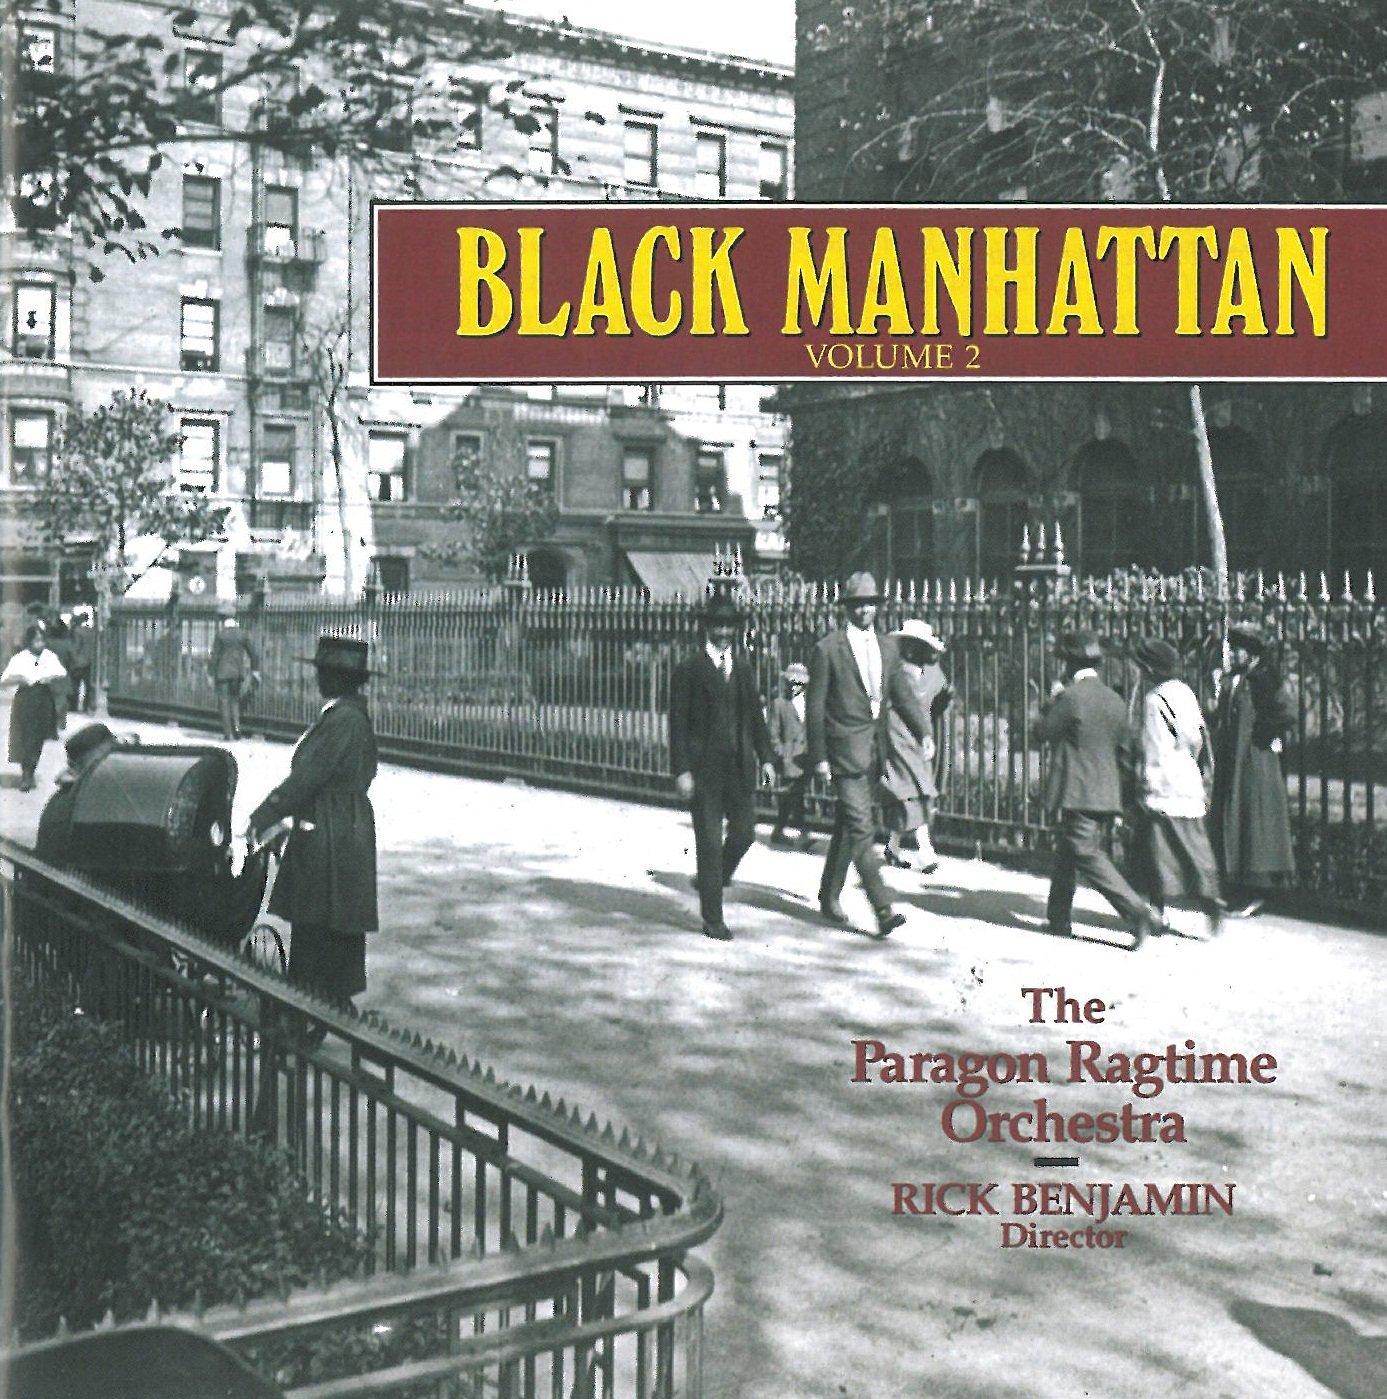 Black Manhattan, Vol. 2